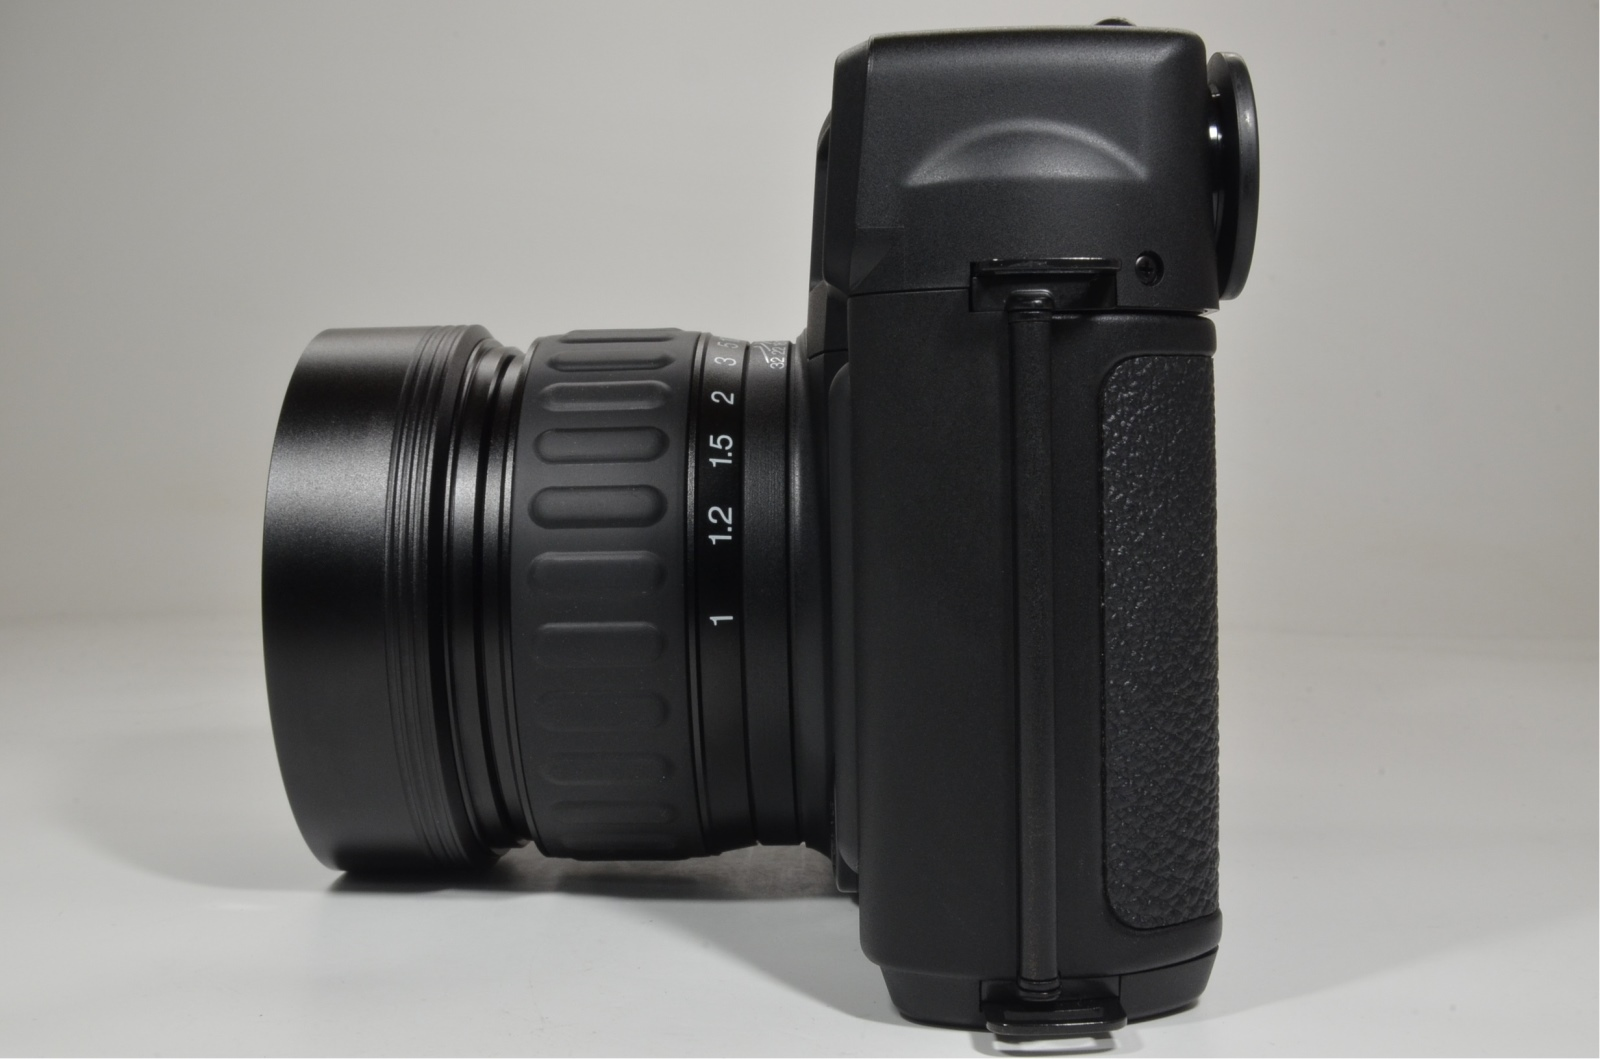 fuji fujifilm gw690iii 90mm f3.5 count only '015' with exposure meter